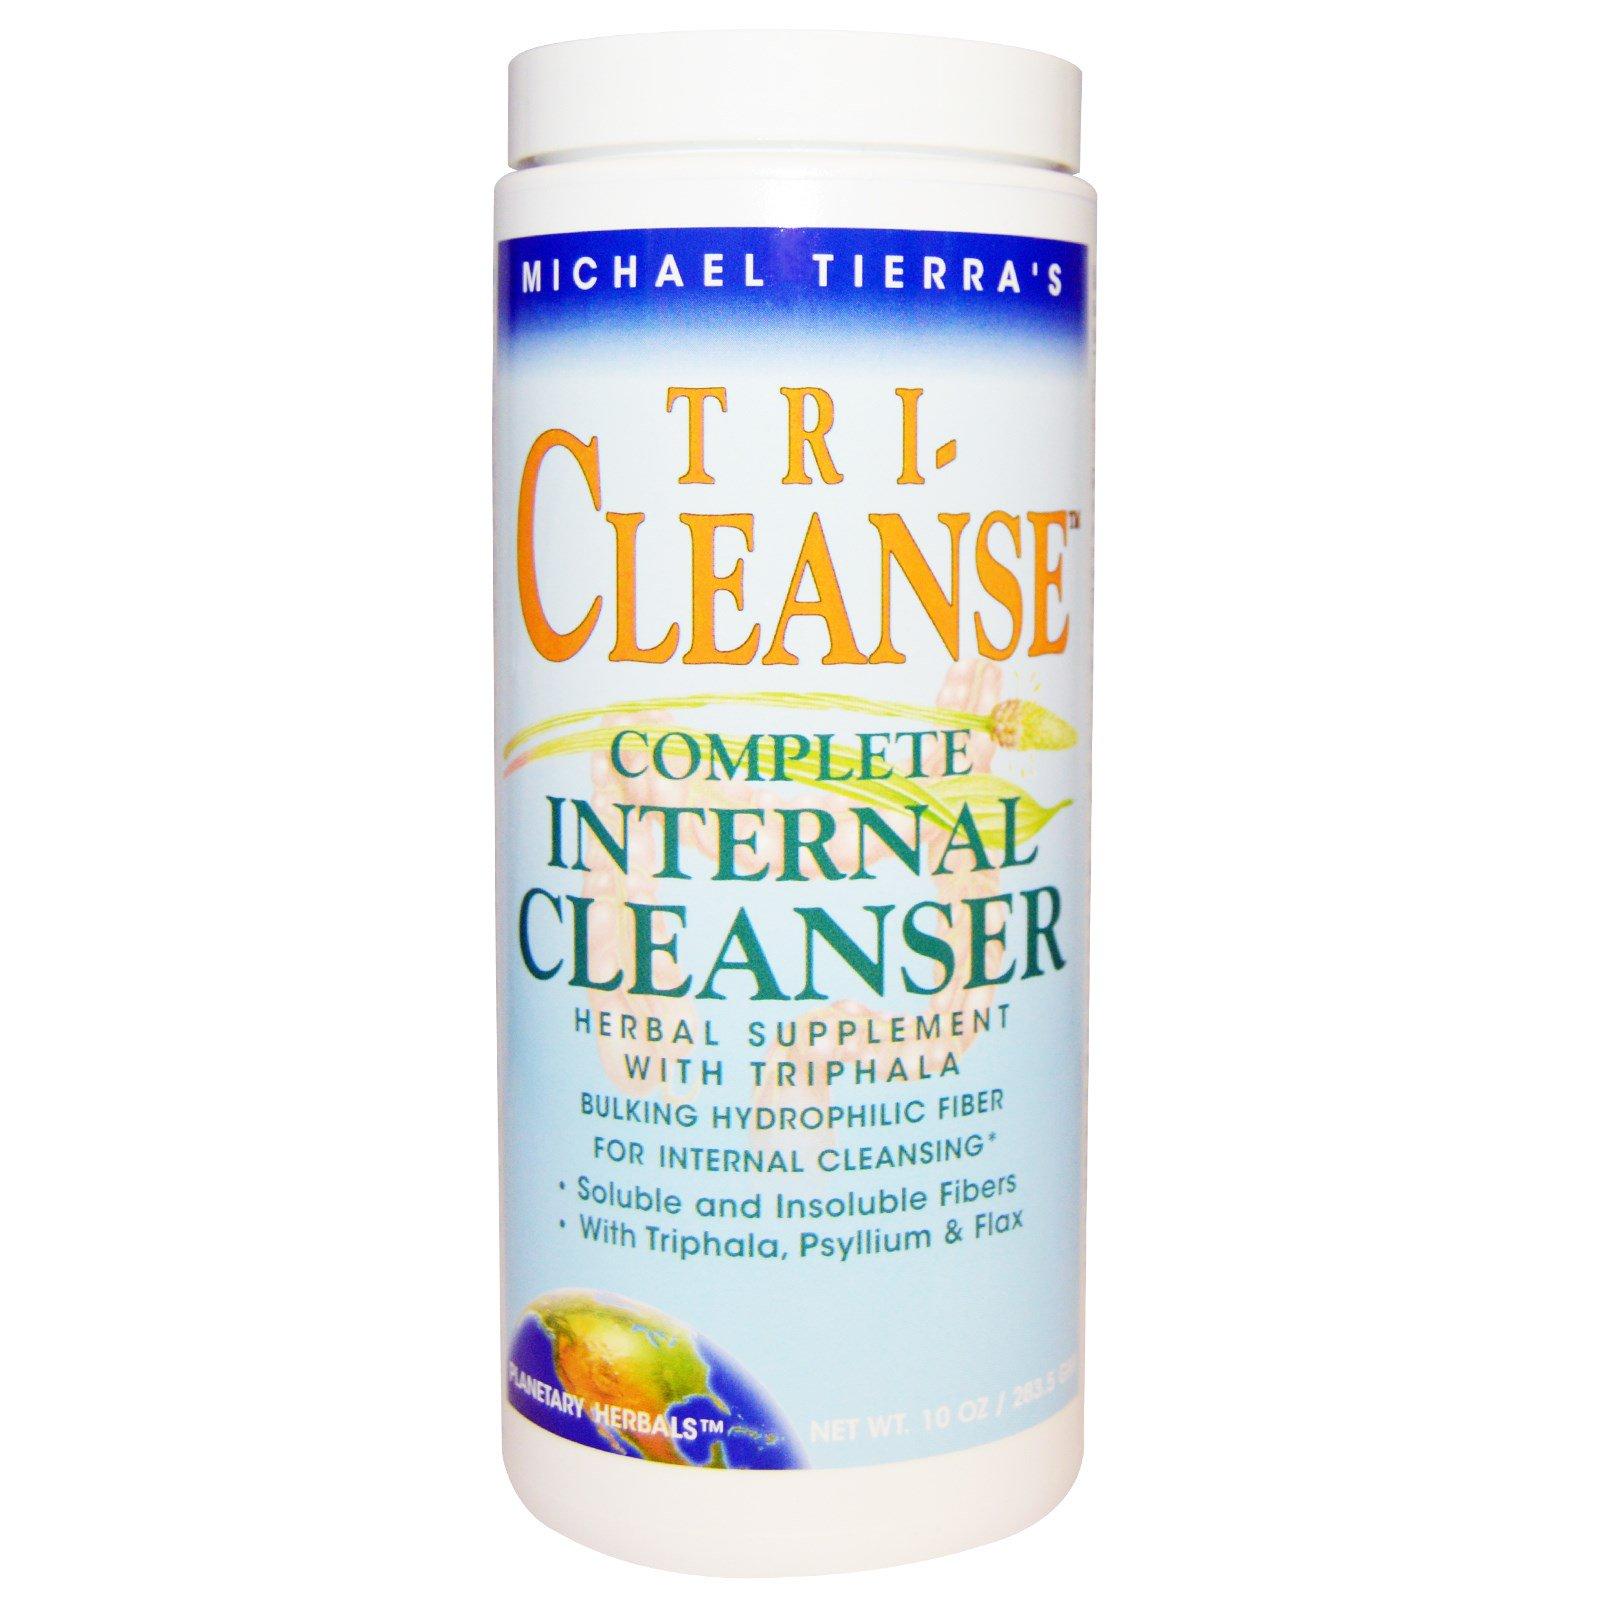 Planetary Herbals, Майкл Терра, Tri-Cleanse, комплексное внутреннее очищение, 10 унций (283,5 г)